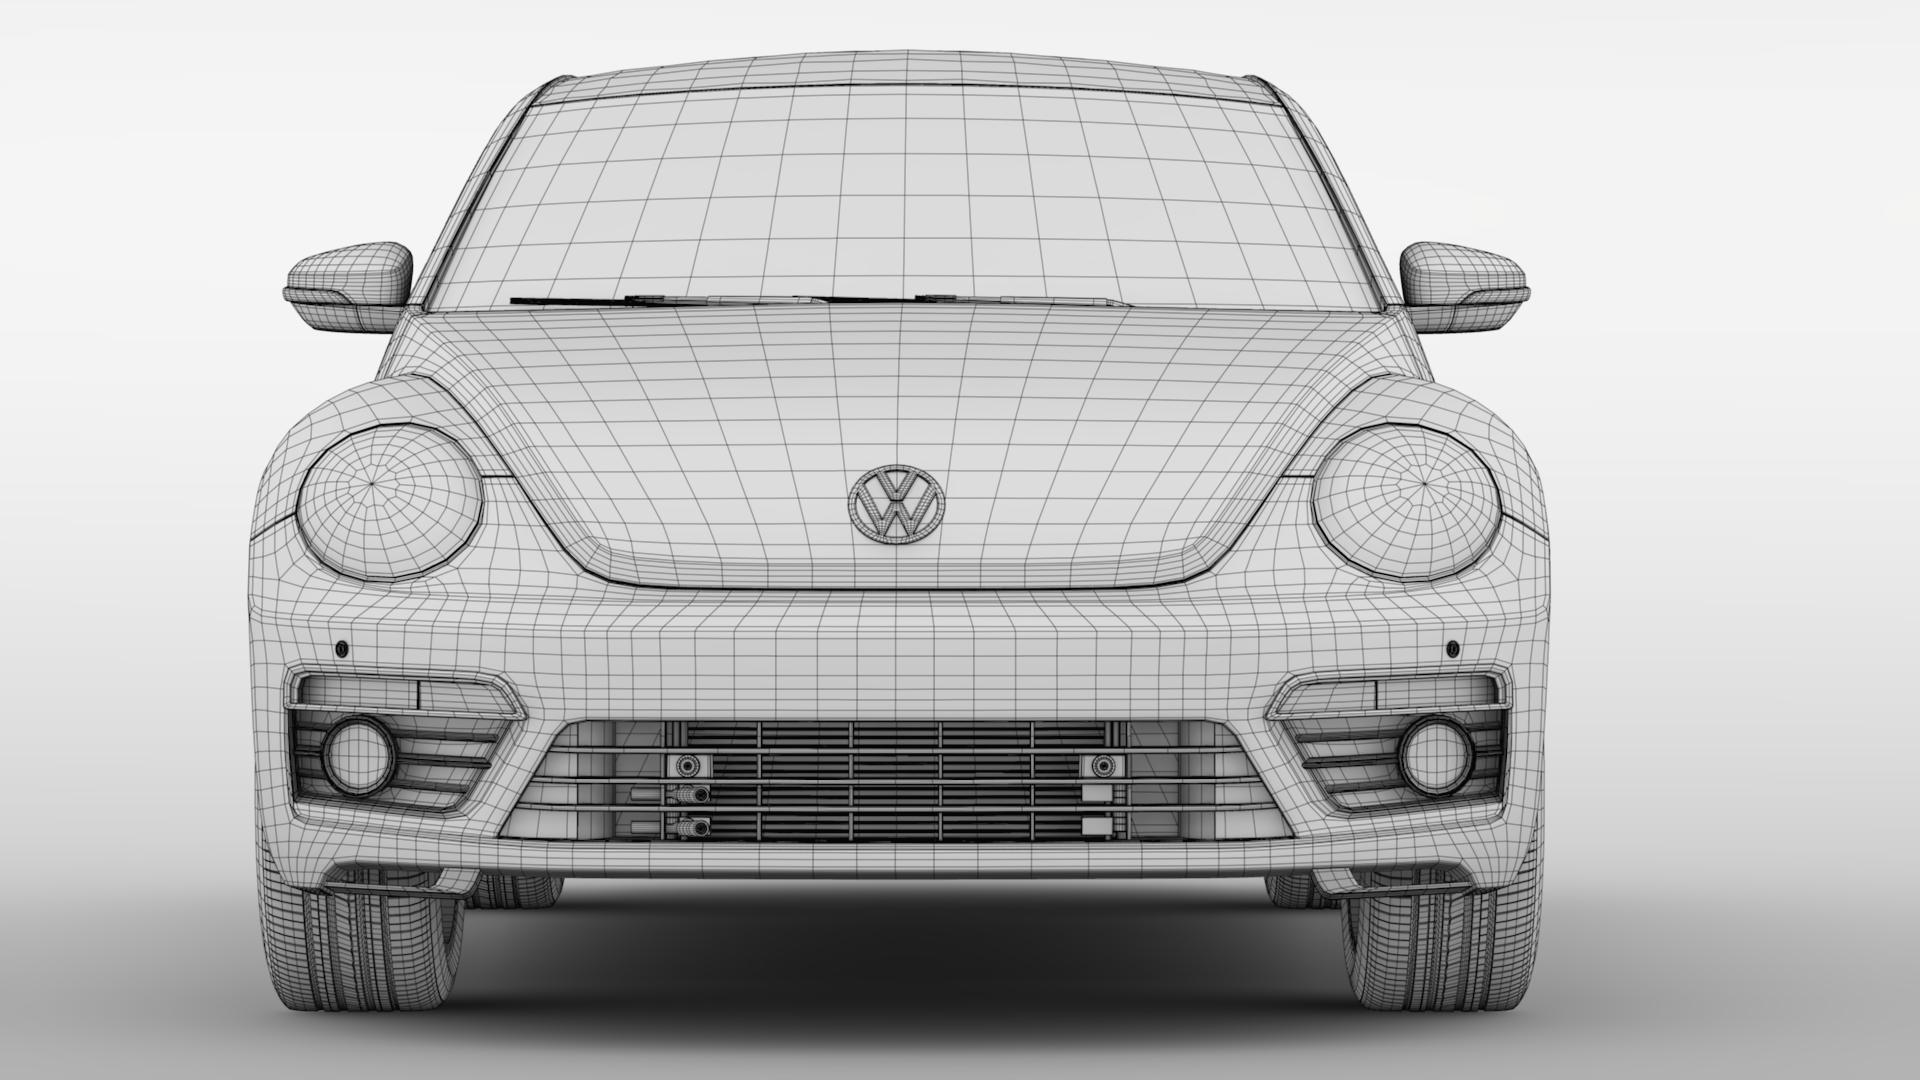 vw beetle turbo 2017 3d model 3ds max fbx c4d lwo ma mb hrc xsi obj 221675